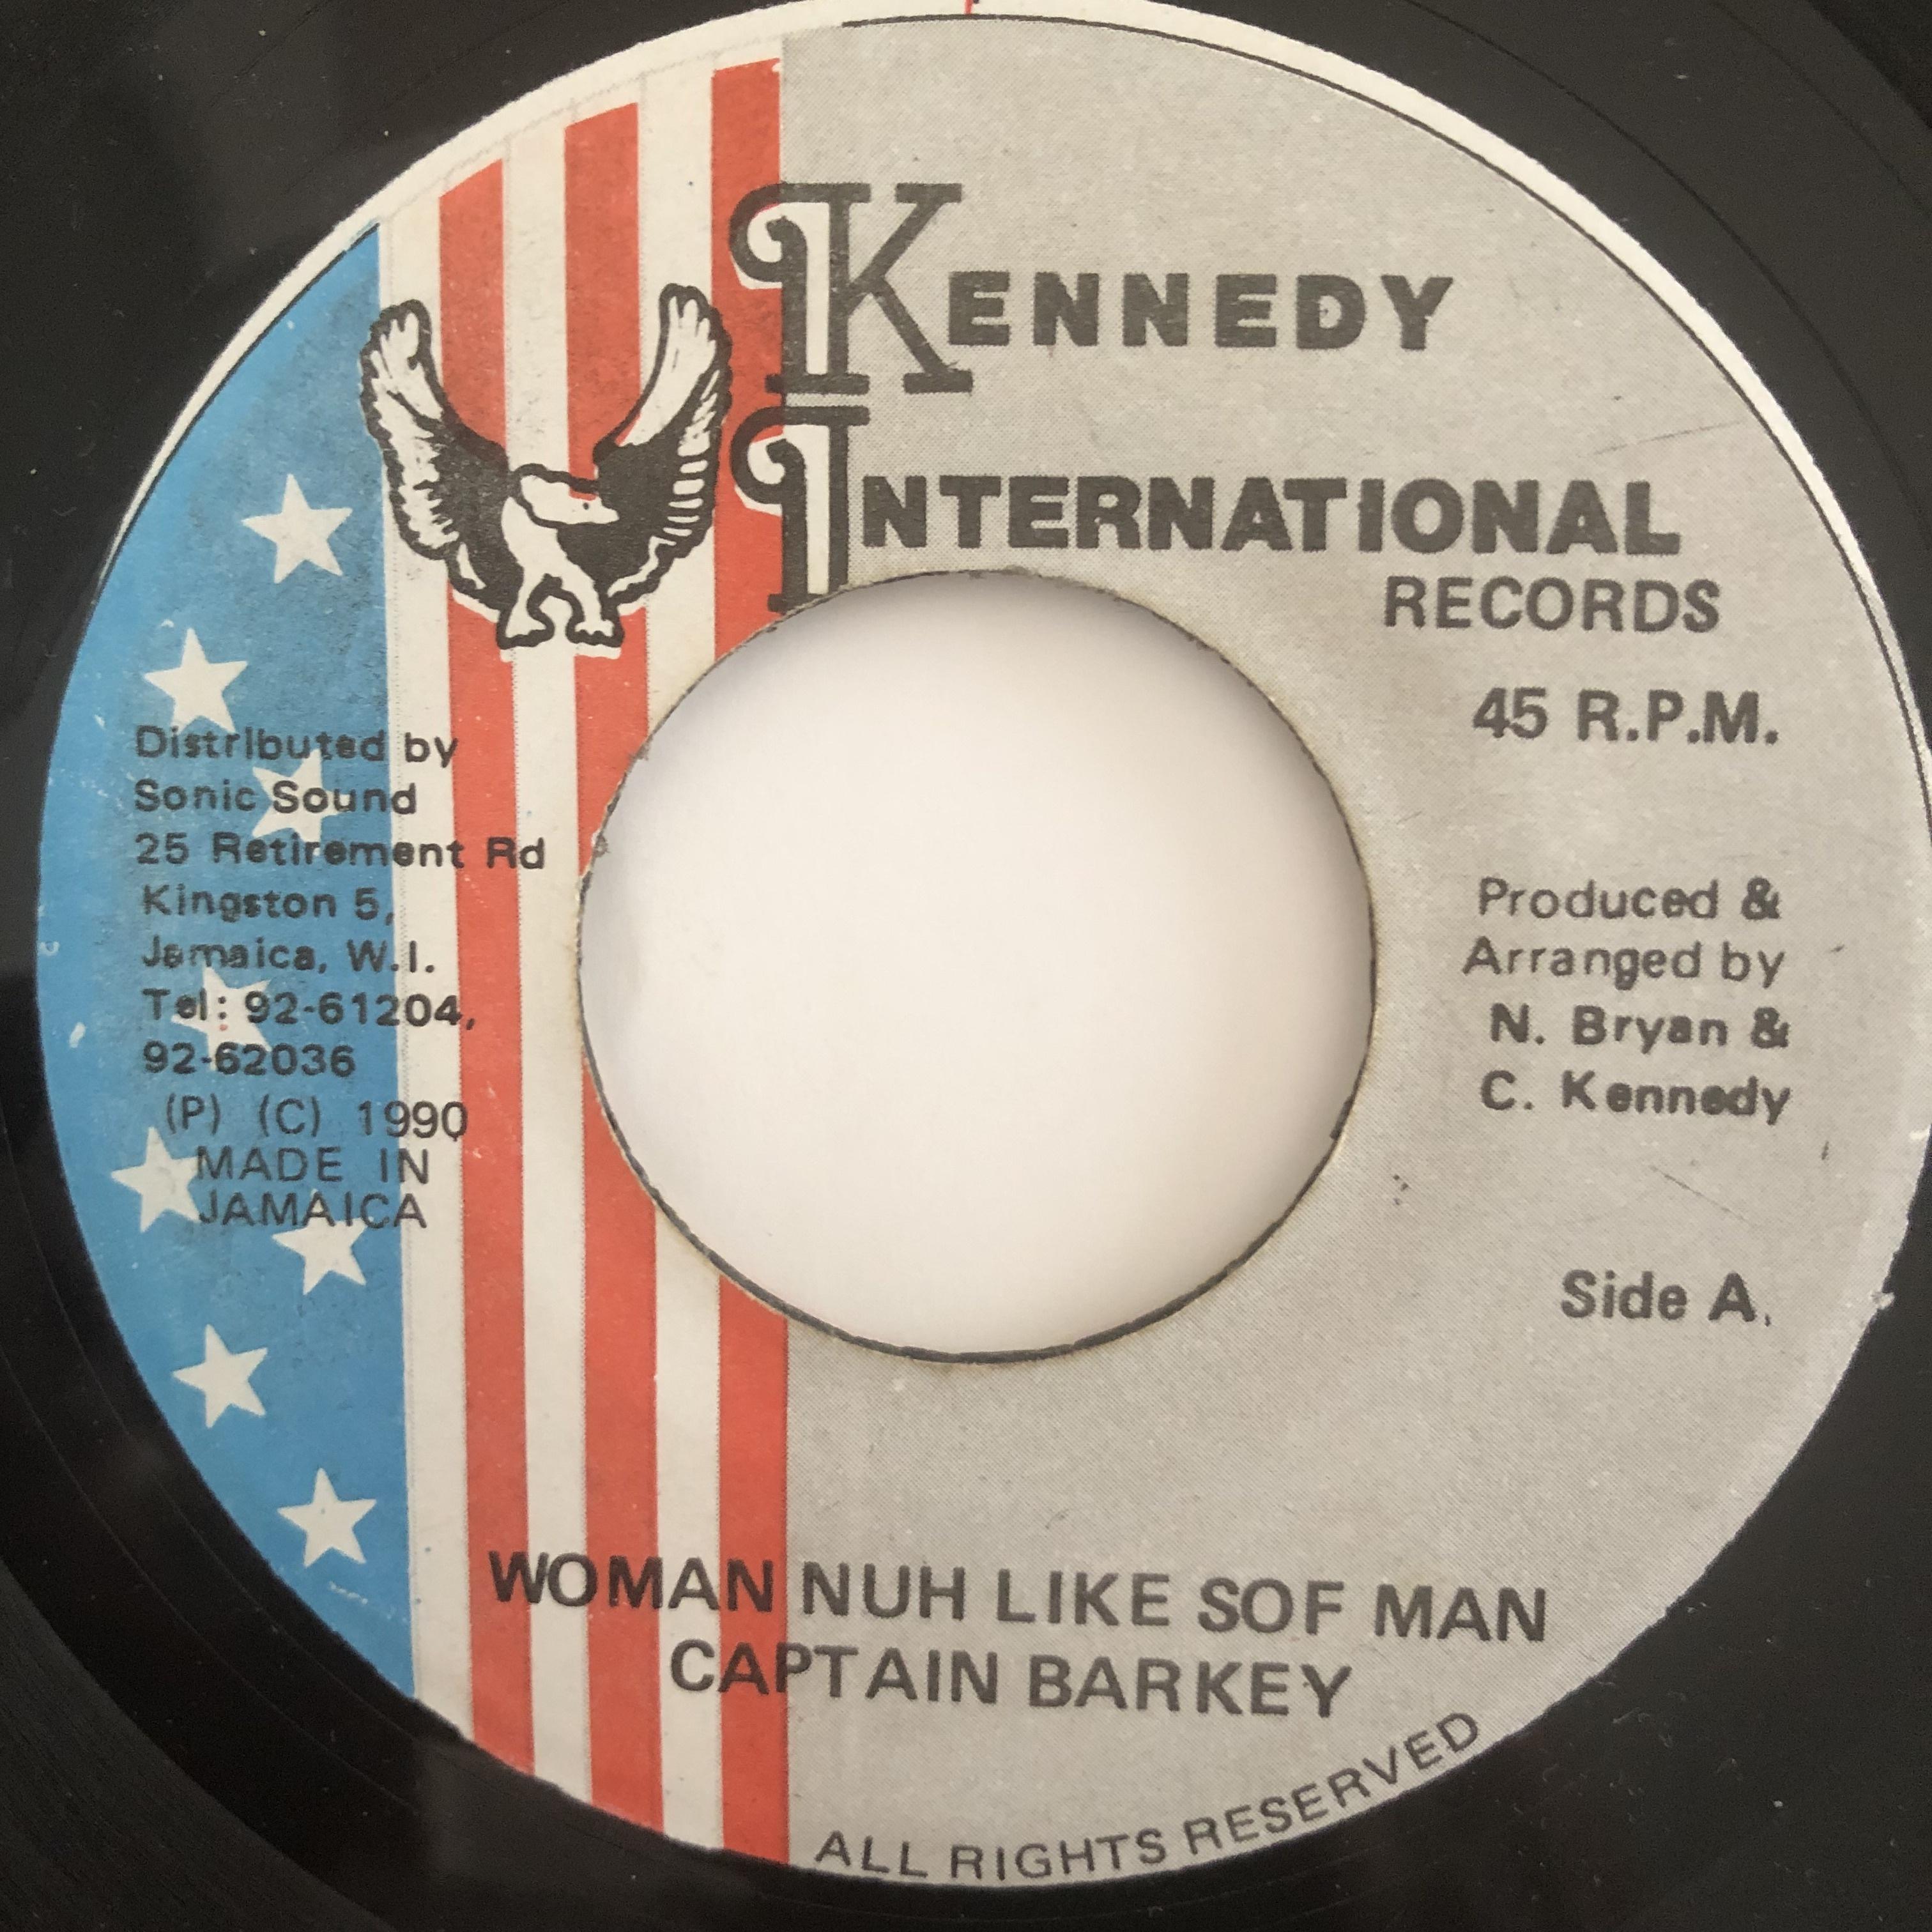 Captain Barkey(キャプテンバーキー) - Woman Nuh Like Sof Man【7-20165】